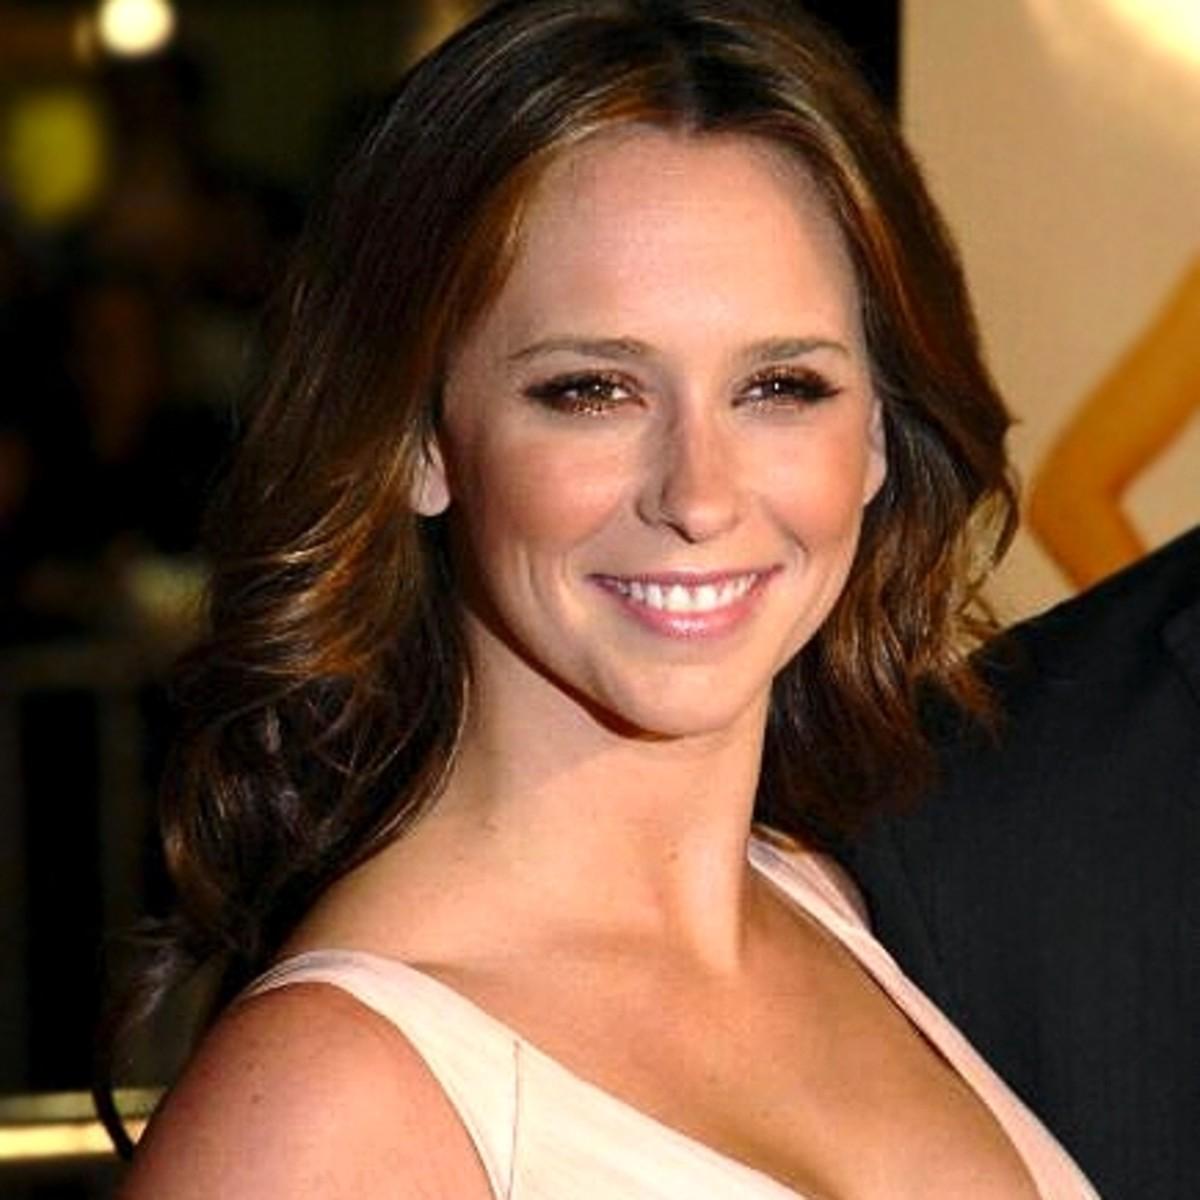 Jennifer Love-Hewitt. Female Celebrities with High Foreheads.